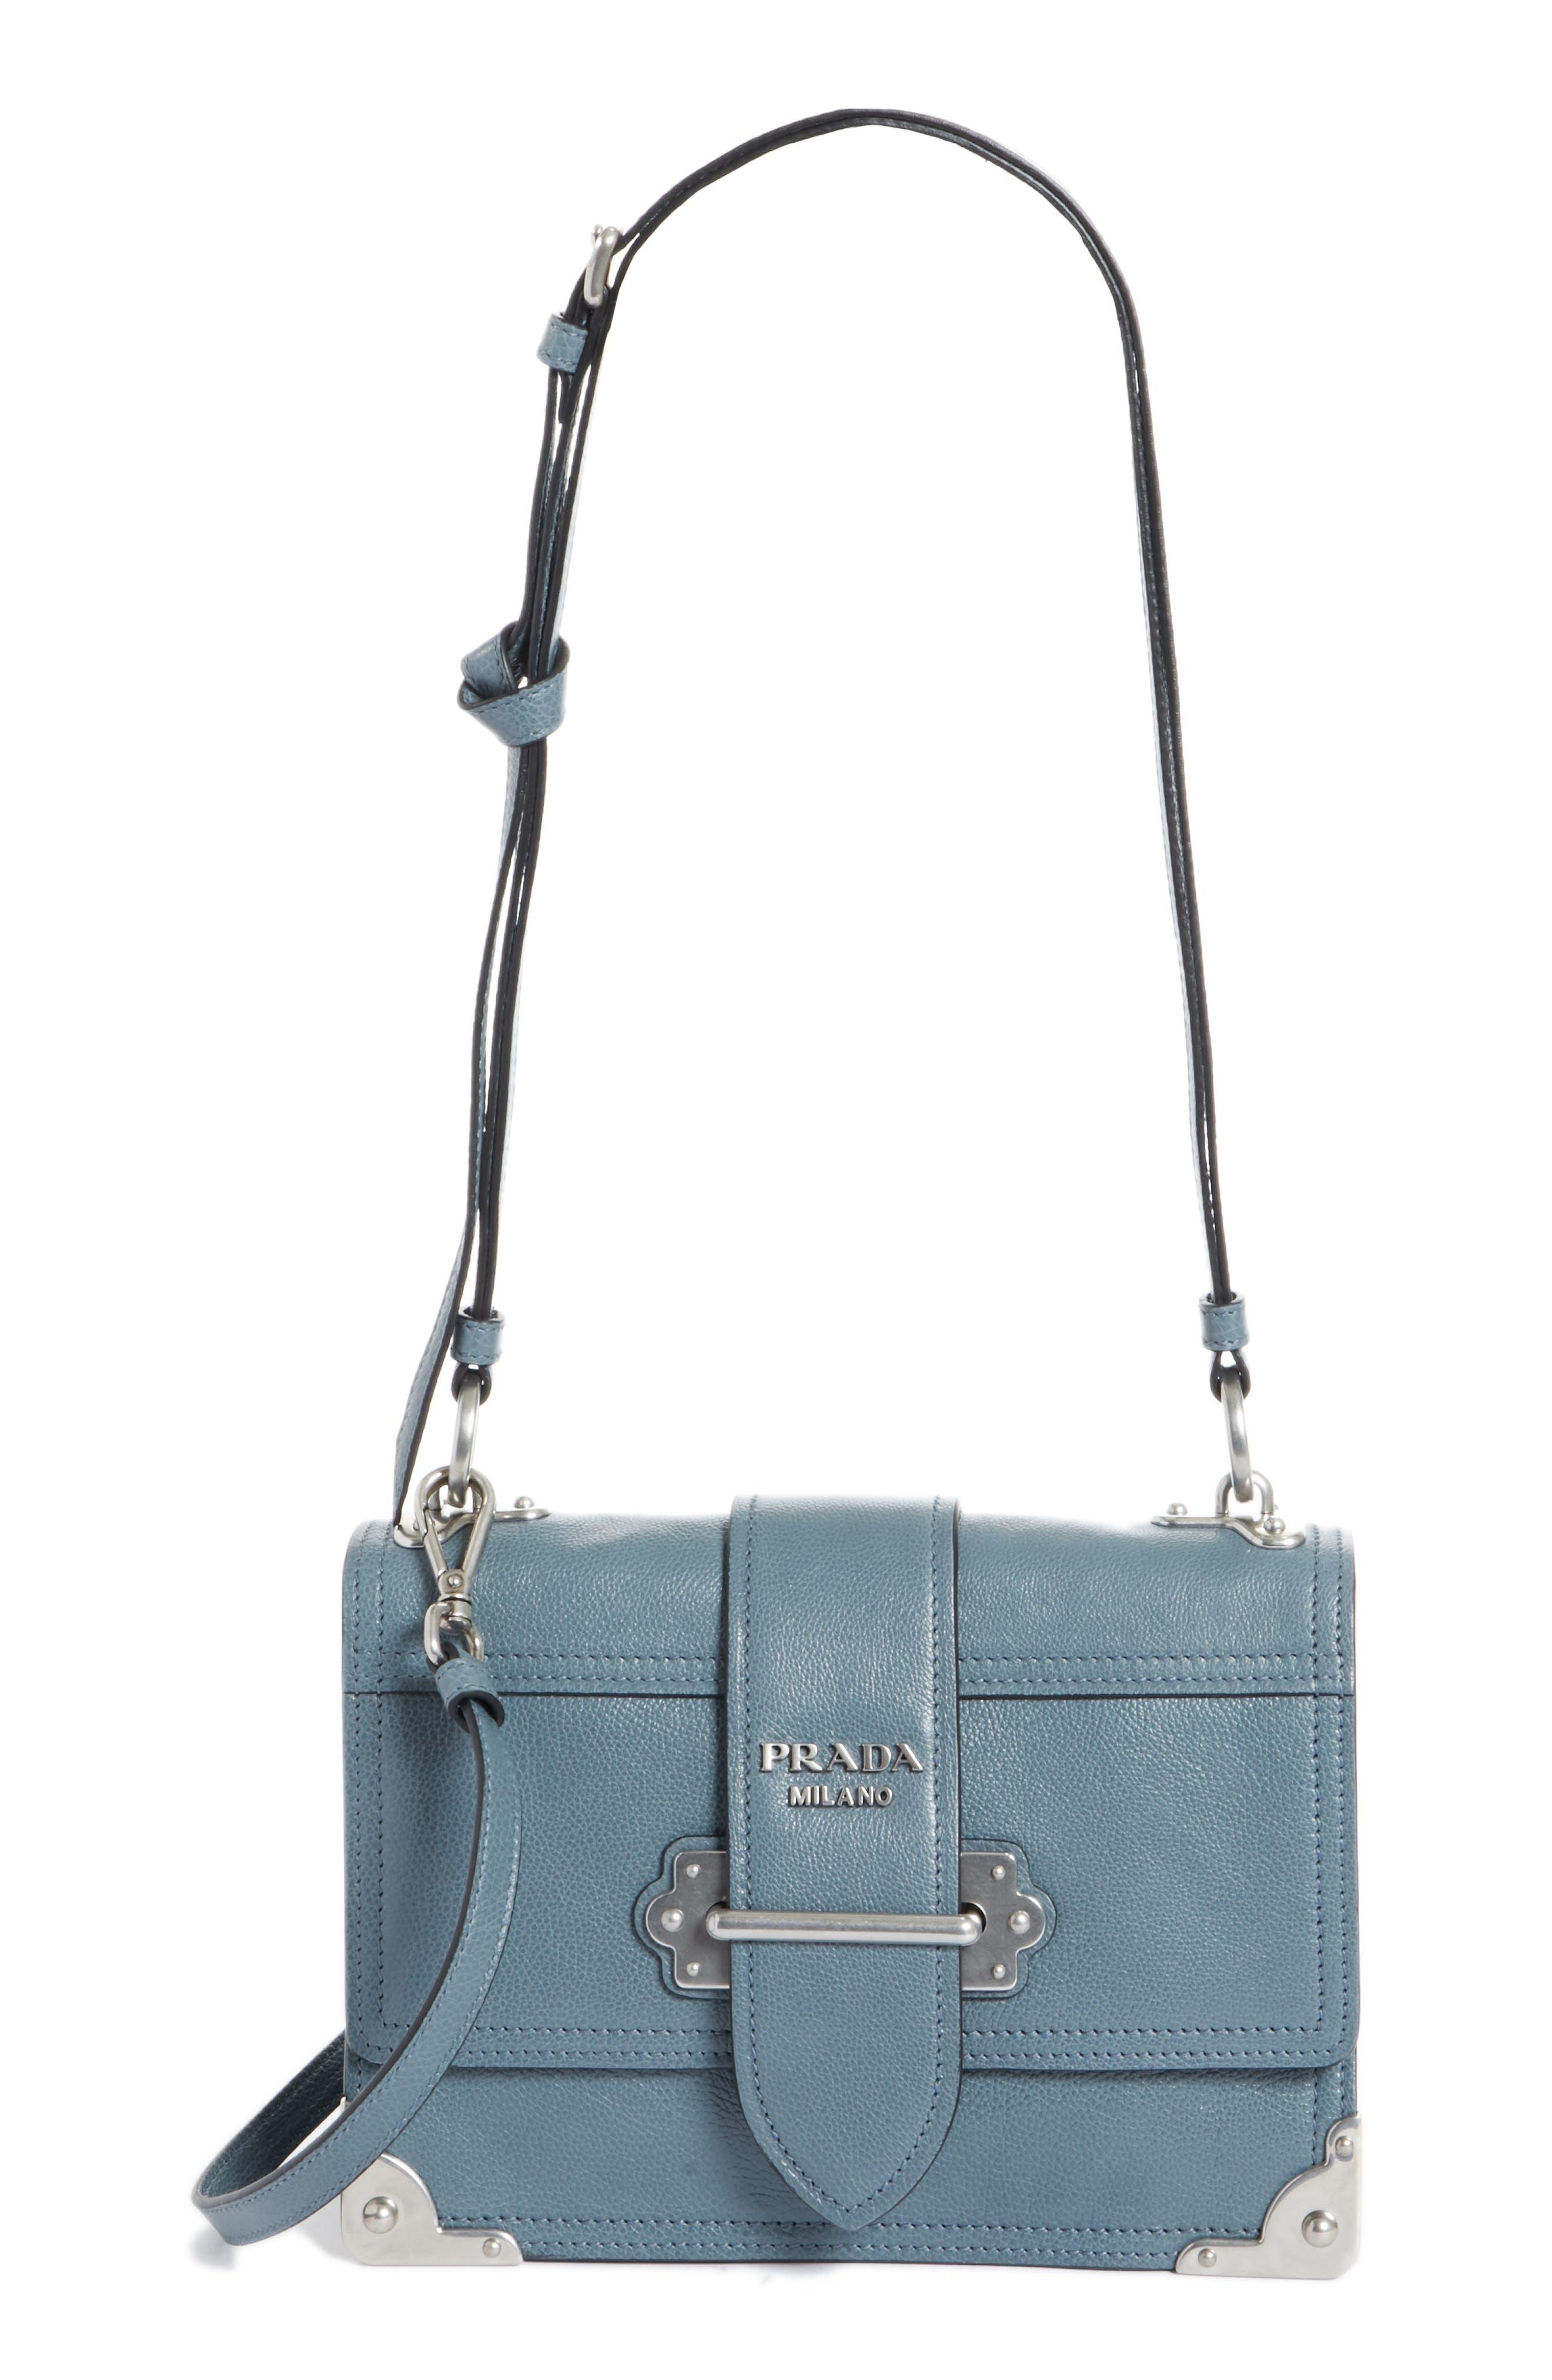 Cahier Glace Calfskin Convertible Shoulder Bag,                             Main thumbnail 1, color,                             MARINE/ ASTRALE 1